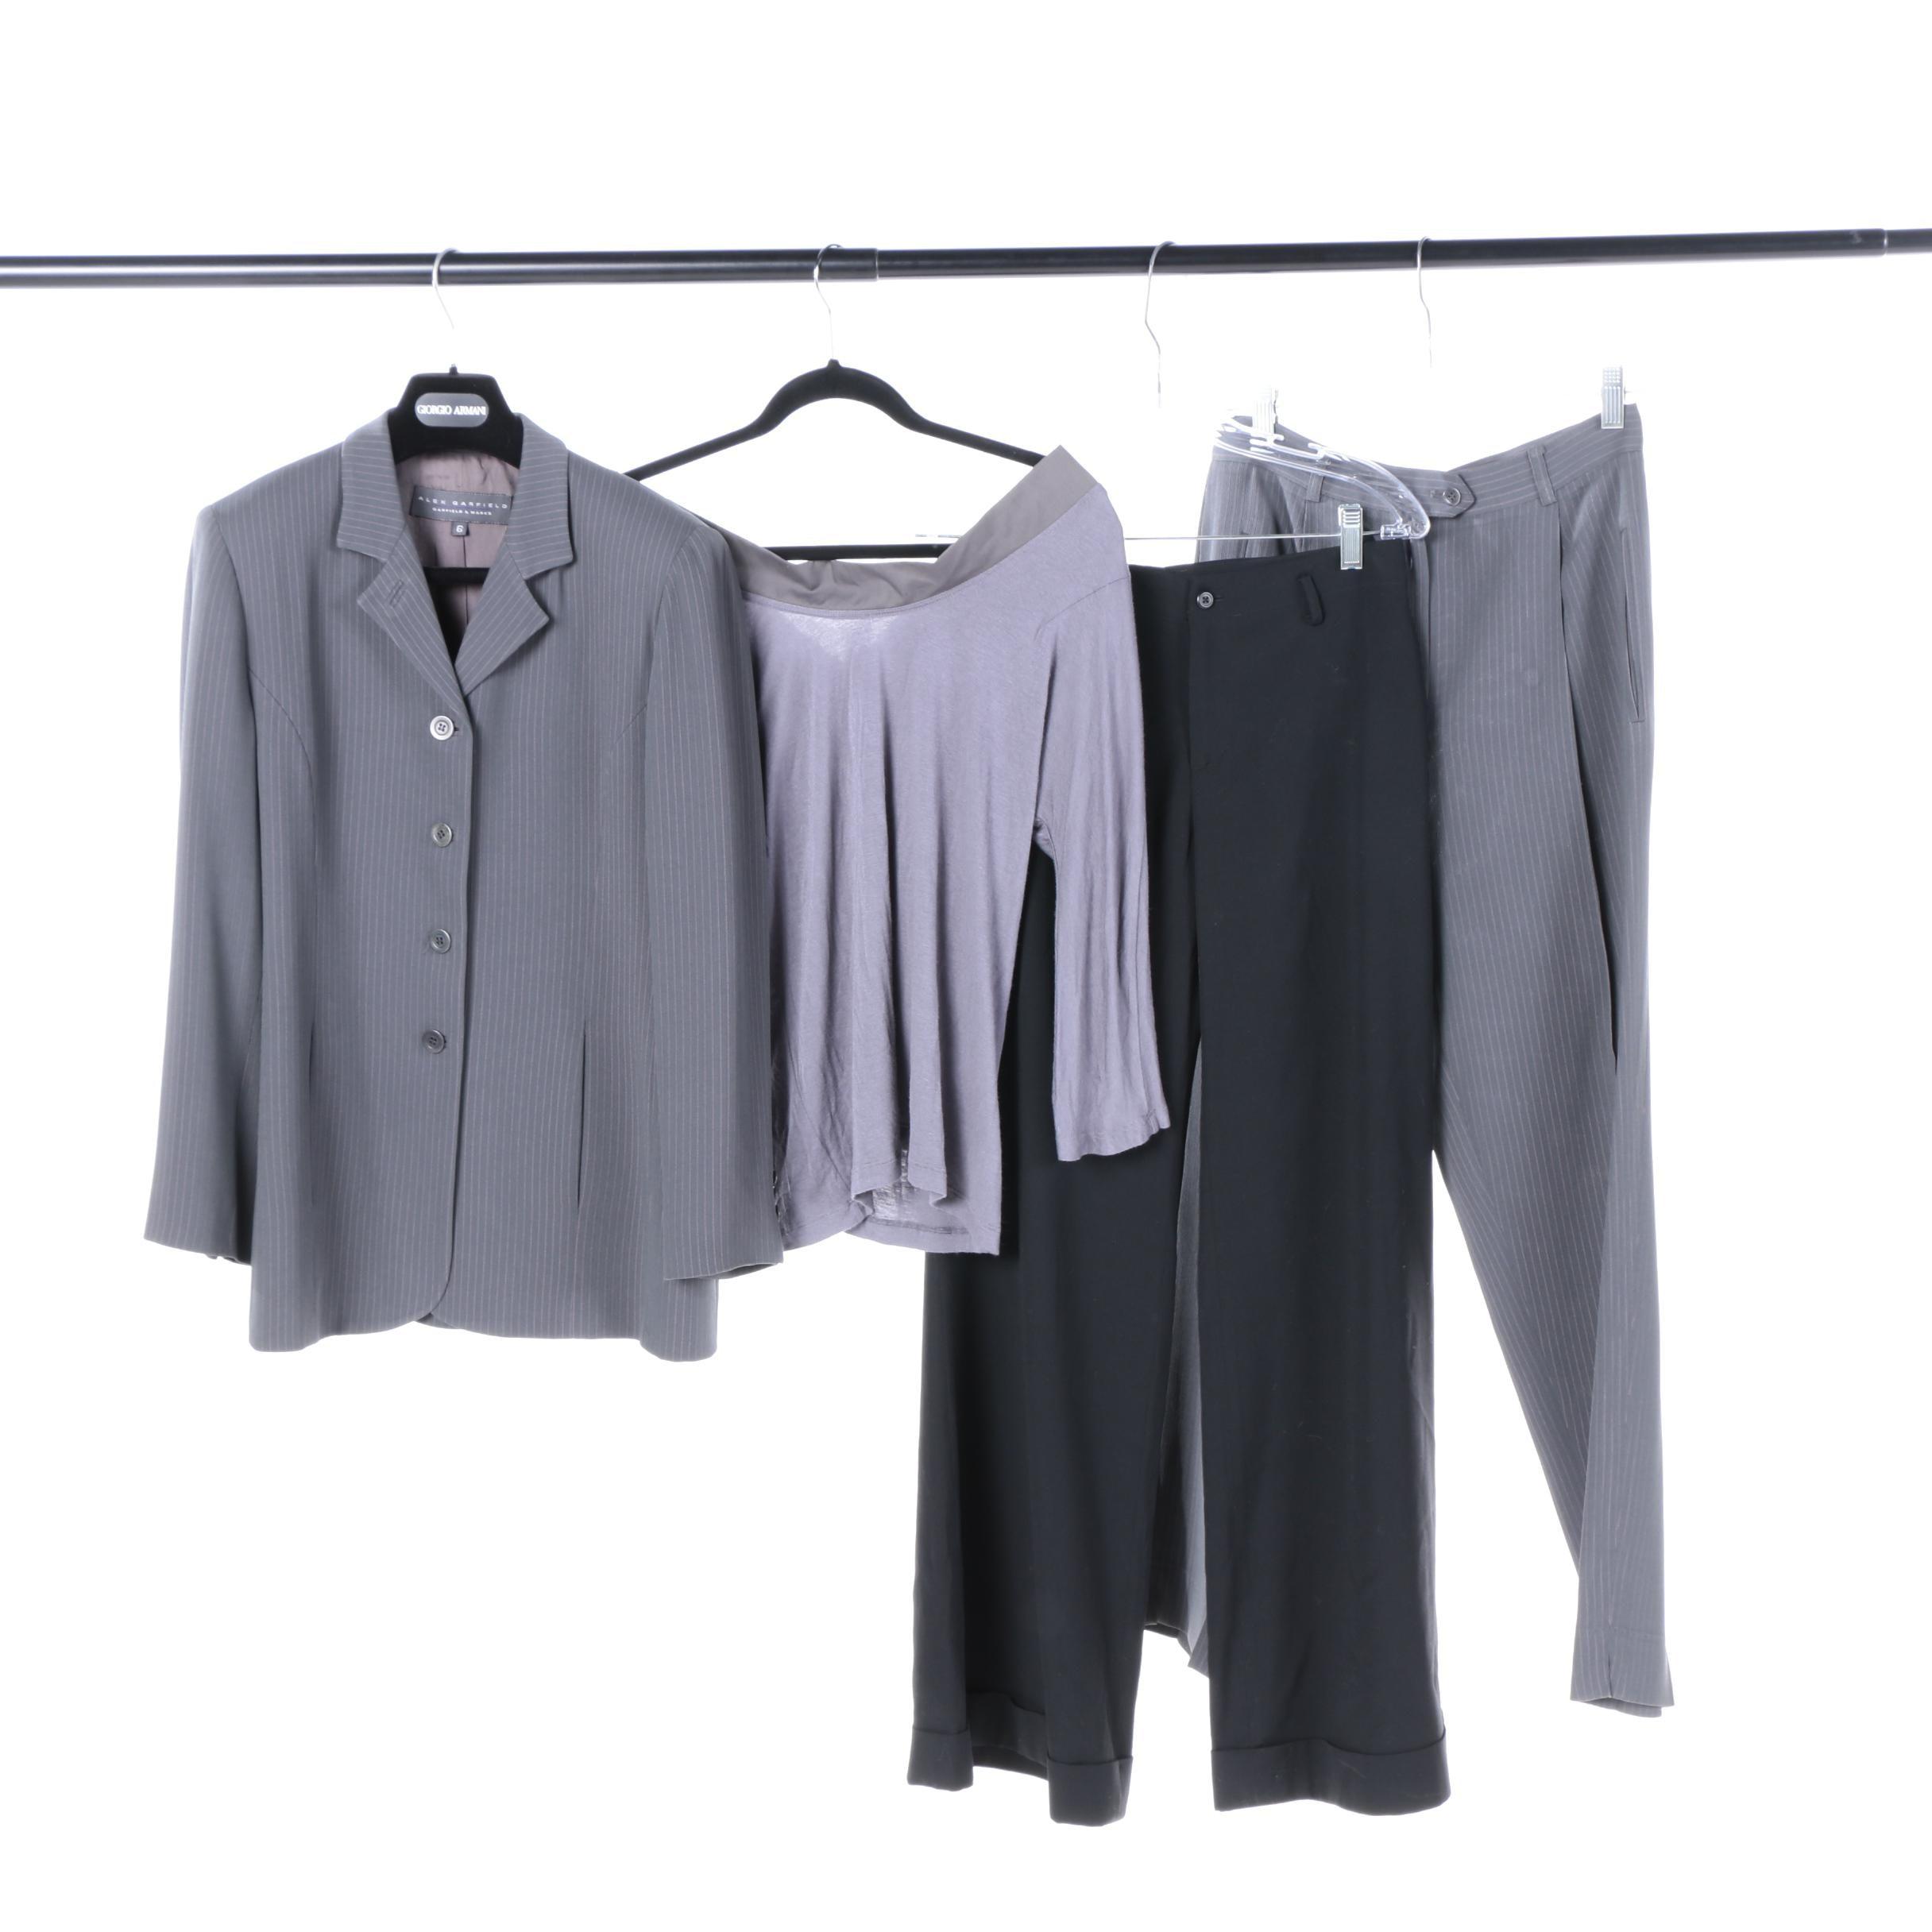 Women's Suit Separates Including Ralph Lauren Collection